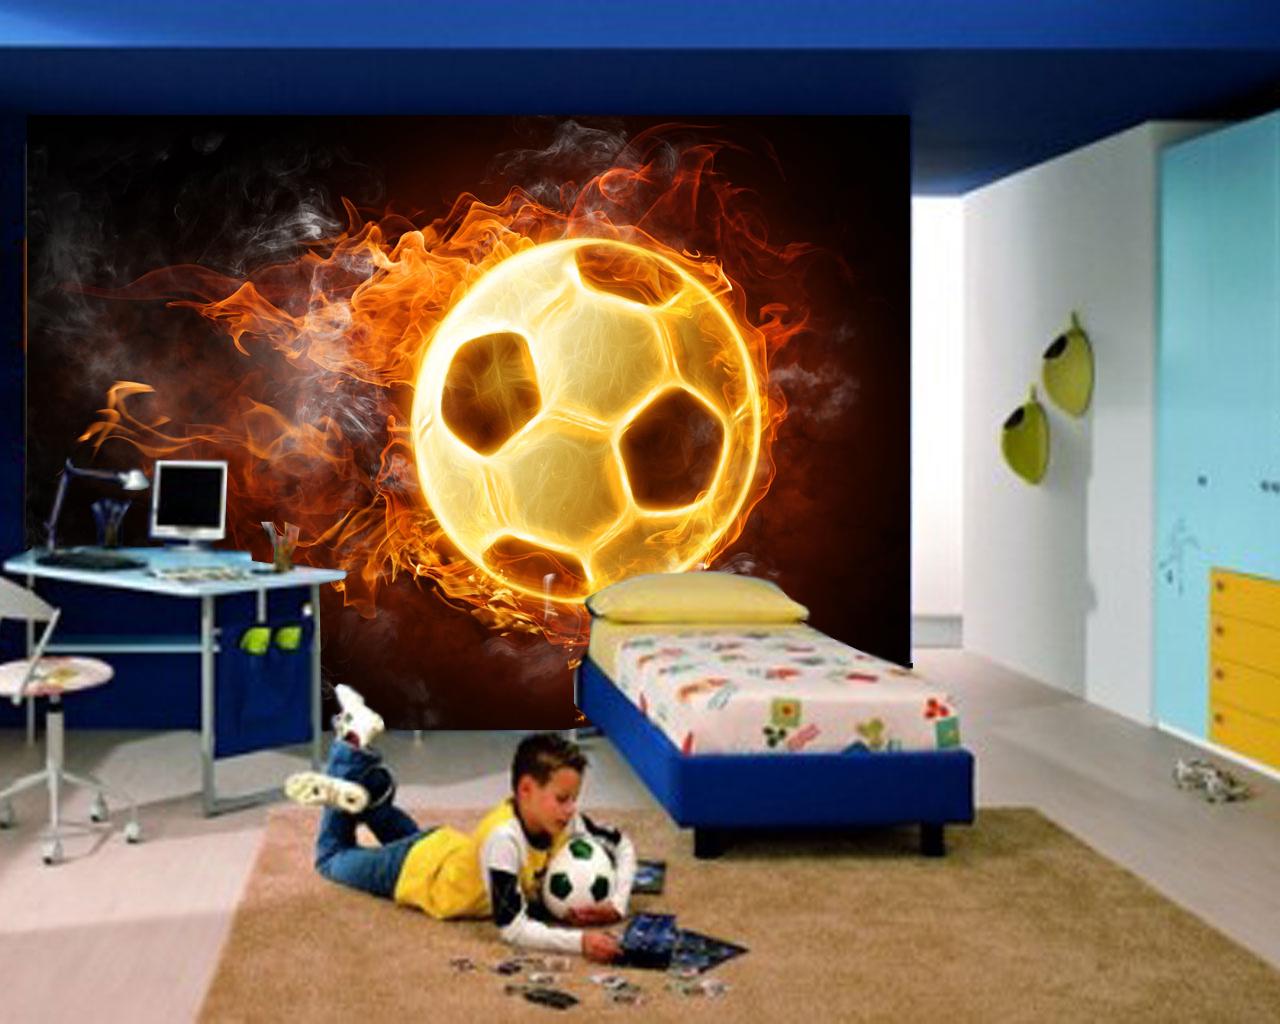 Wallpaper kamar anak bola jualwallpaper dindinginteriorkamaranak 1280x1024